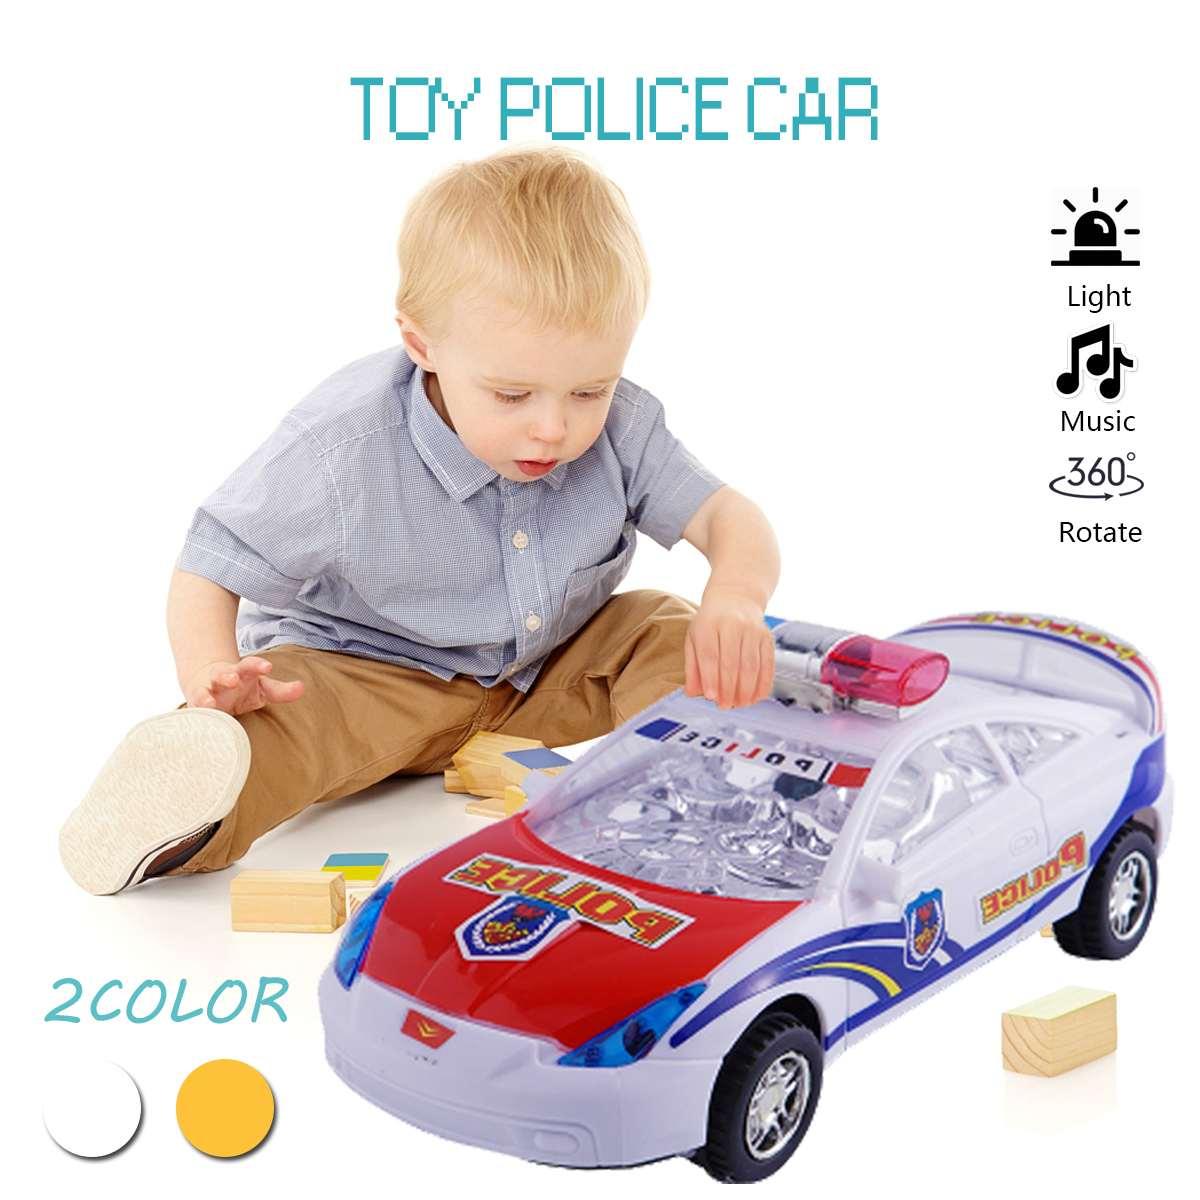 Coches de juguete LED de magia negra con luces parpadeantes, coches de policía brillantes, juguetes educativos para niños y niñas, regalo de cumpleaños, juguetes para niños